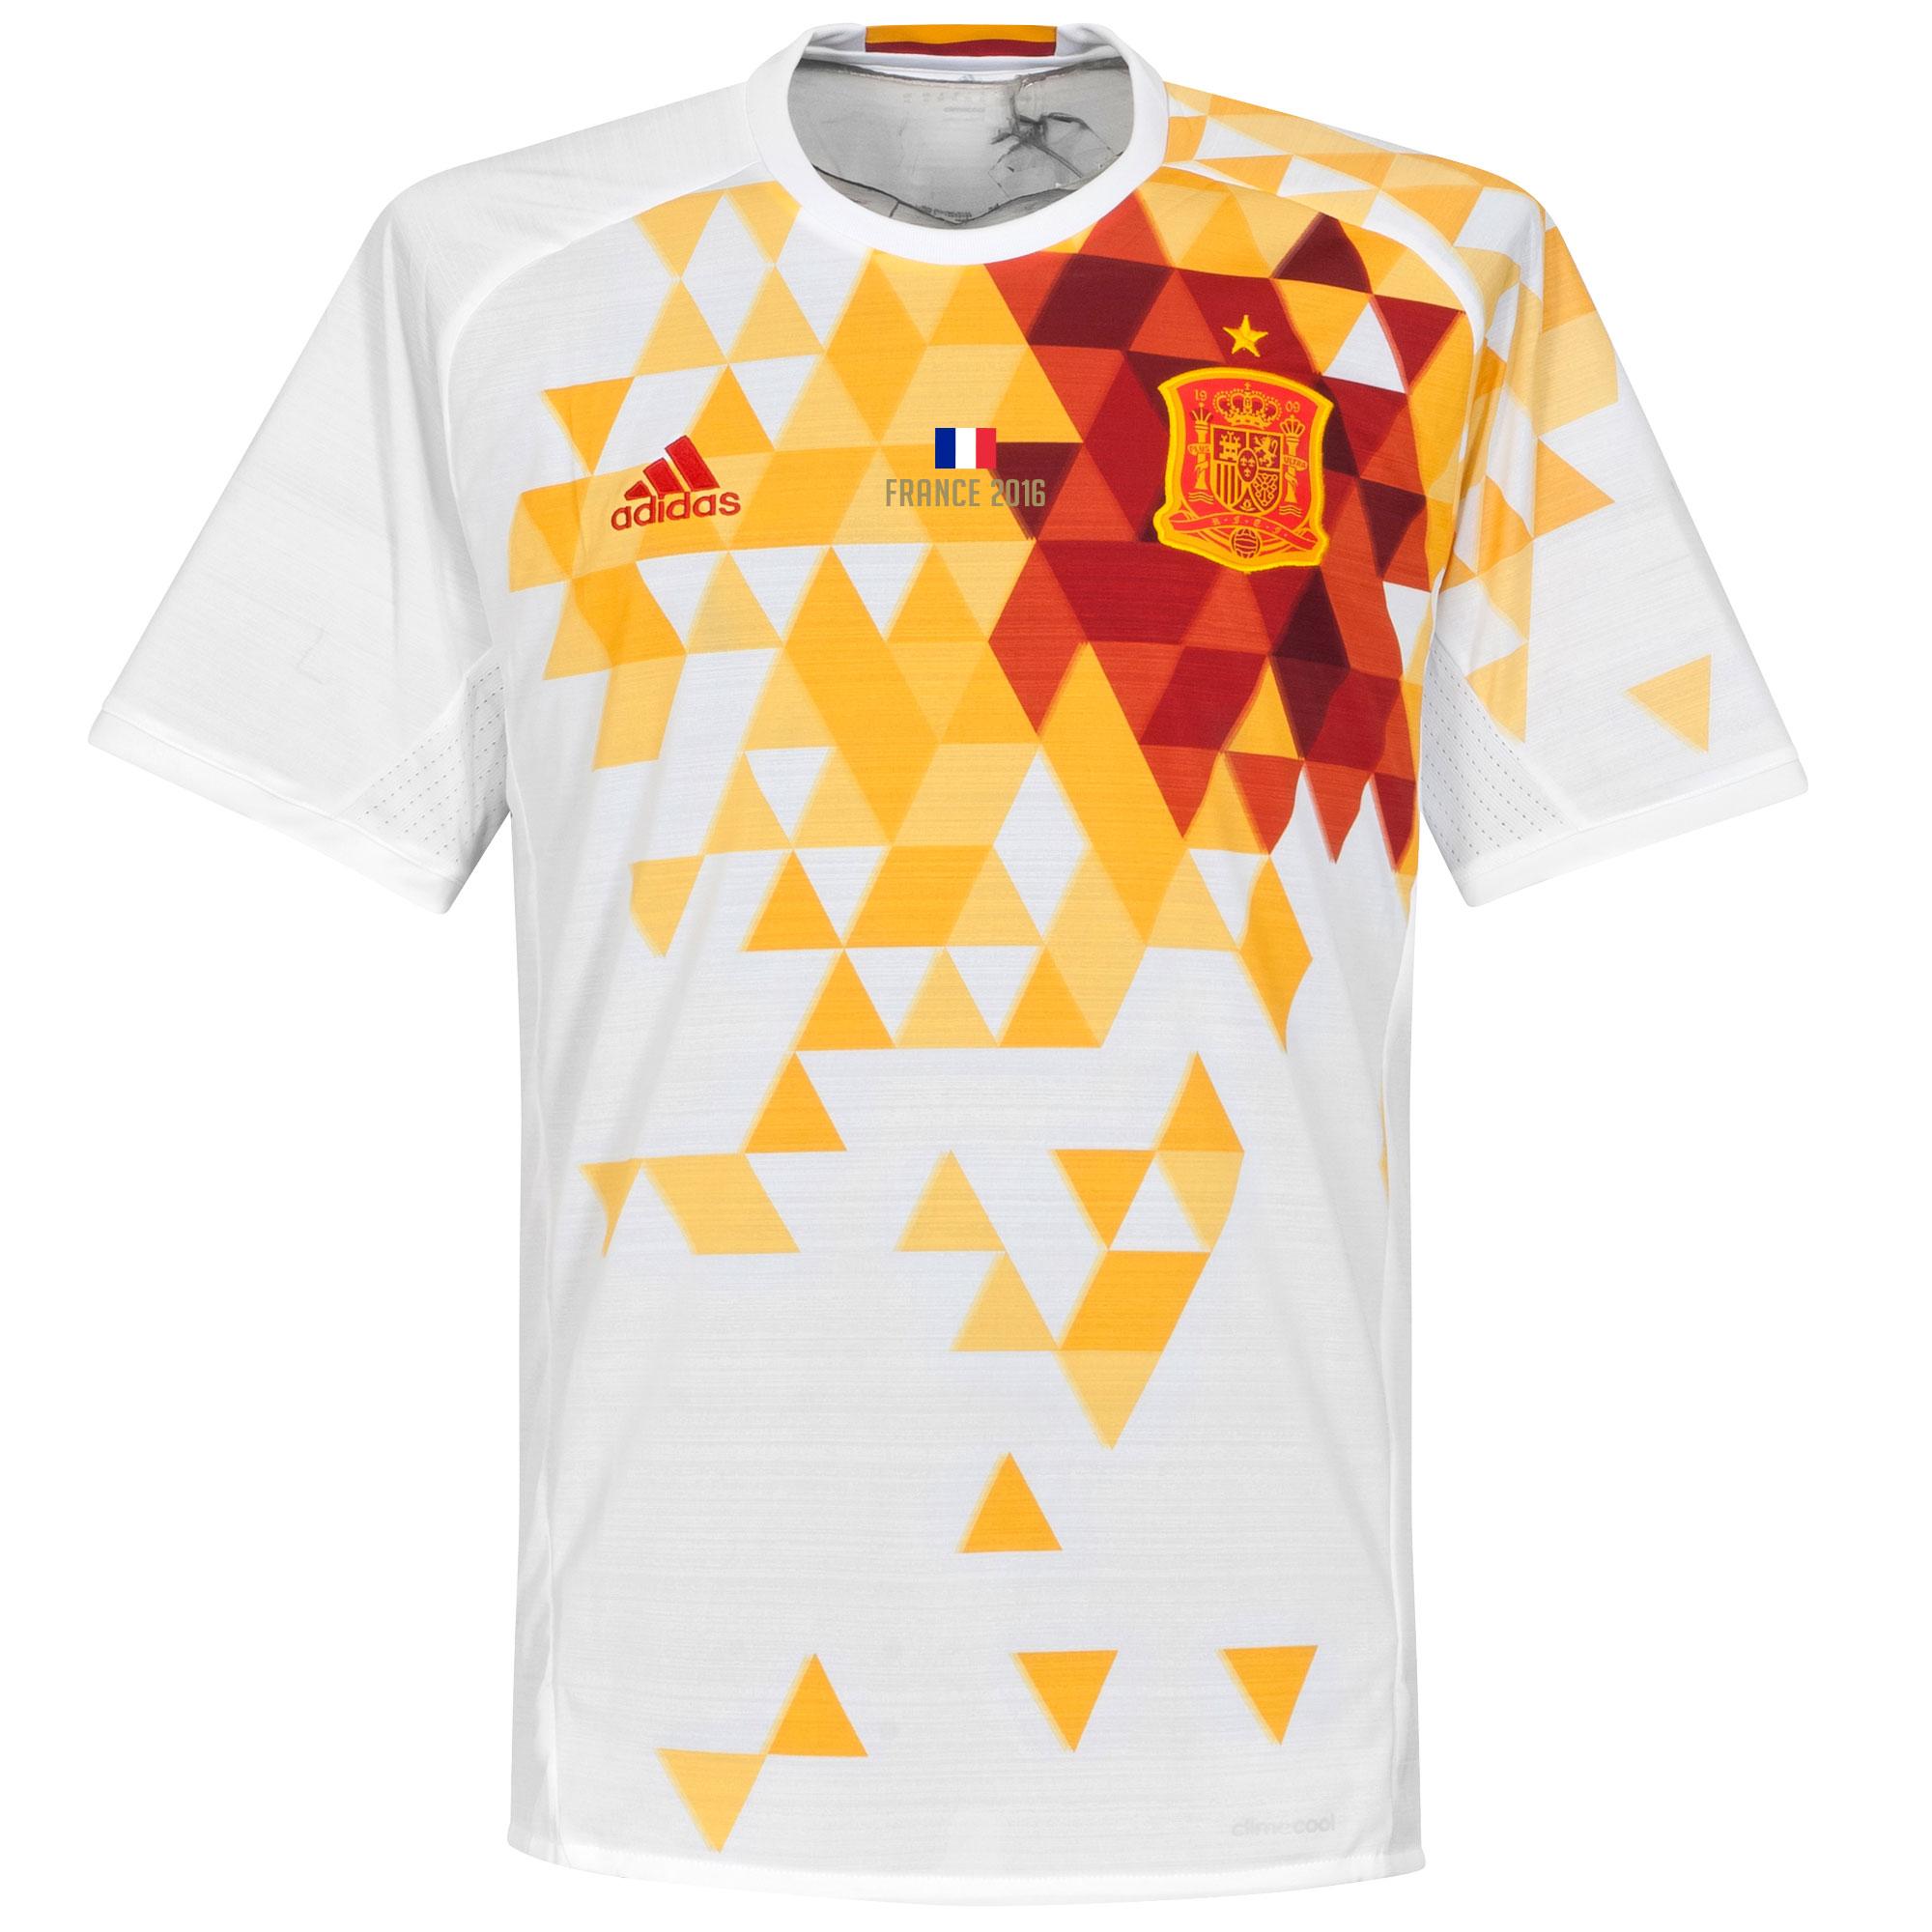 Spain Away Jersey 2016 / 2017 + France 2016 Transfer - 46